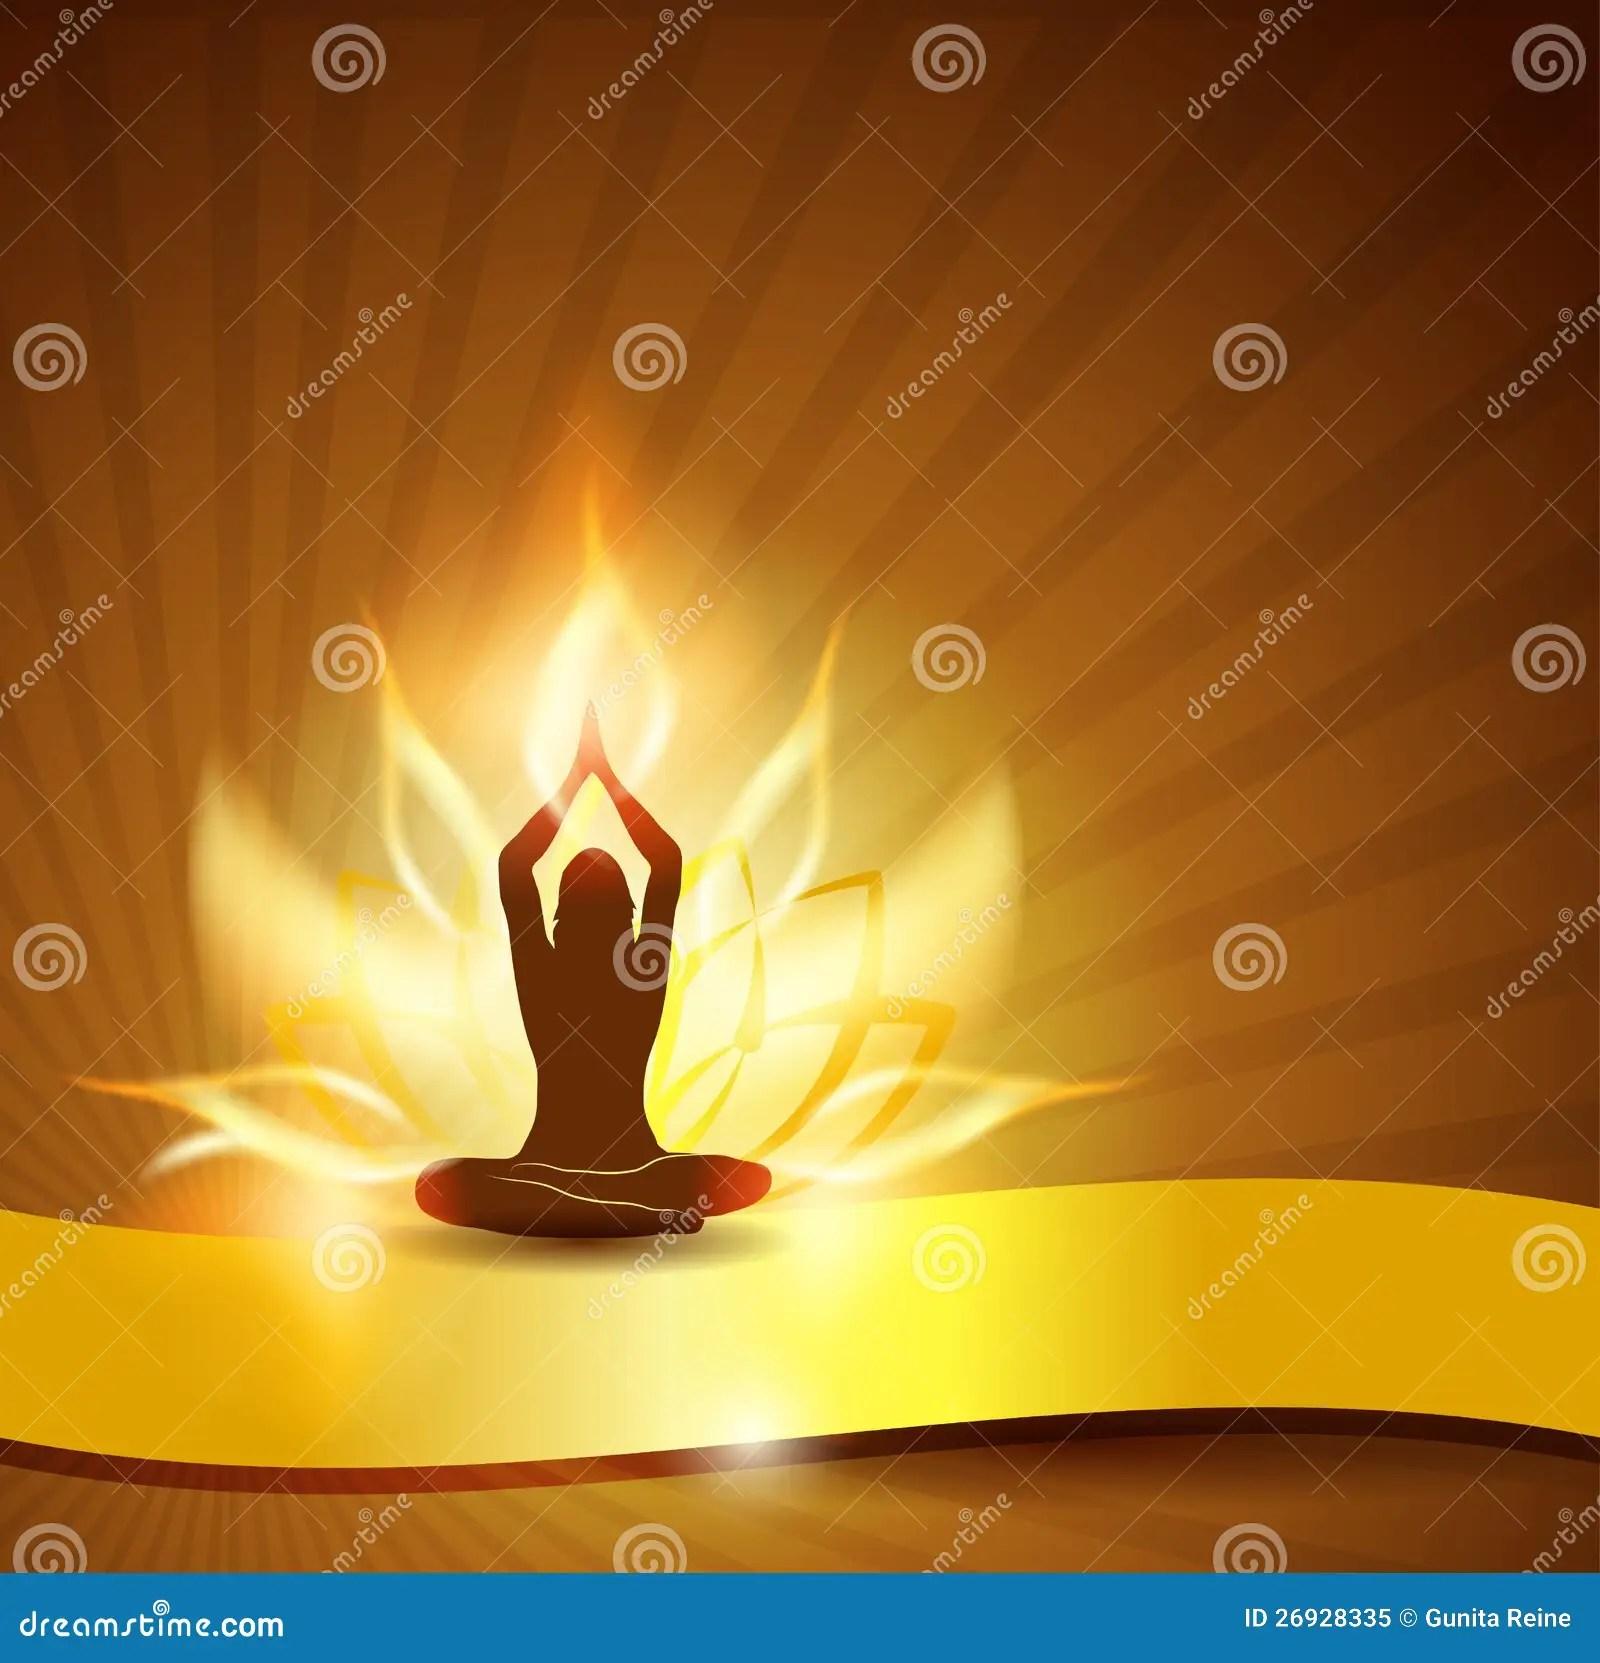 Wallpaper Fitness Girl Lotus Flower Fire And Yoga Stock Vector Image 26928335